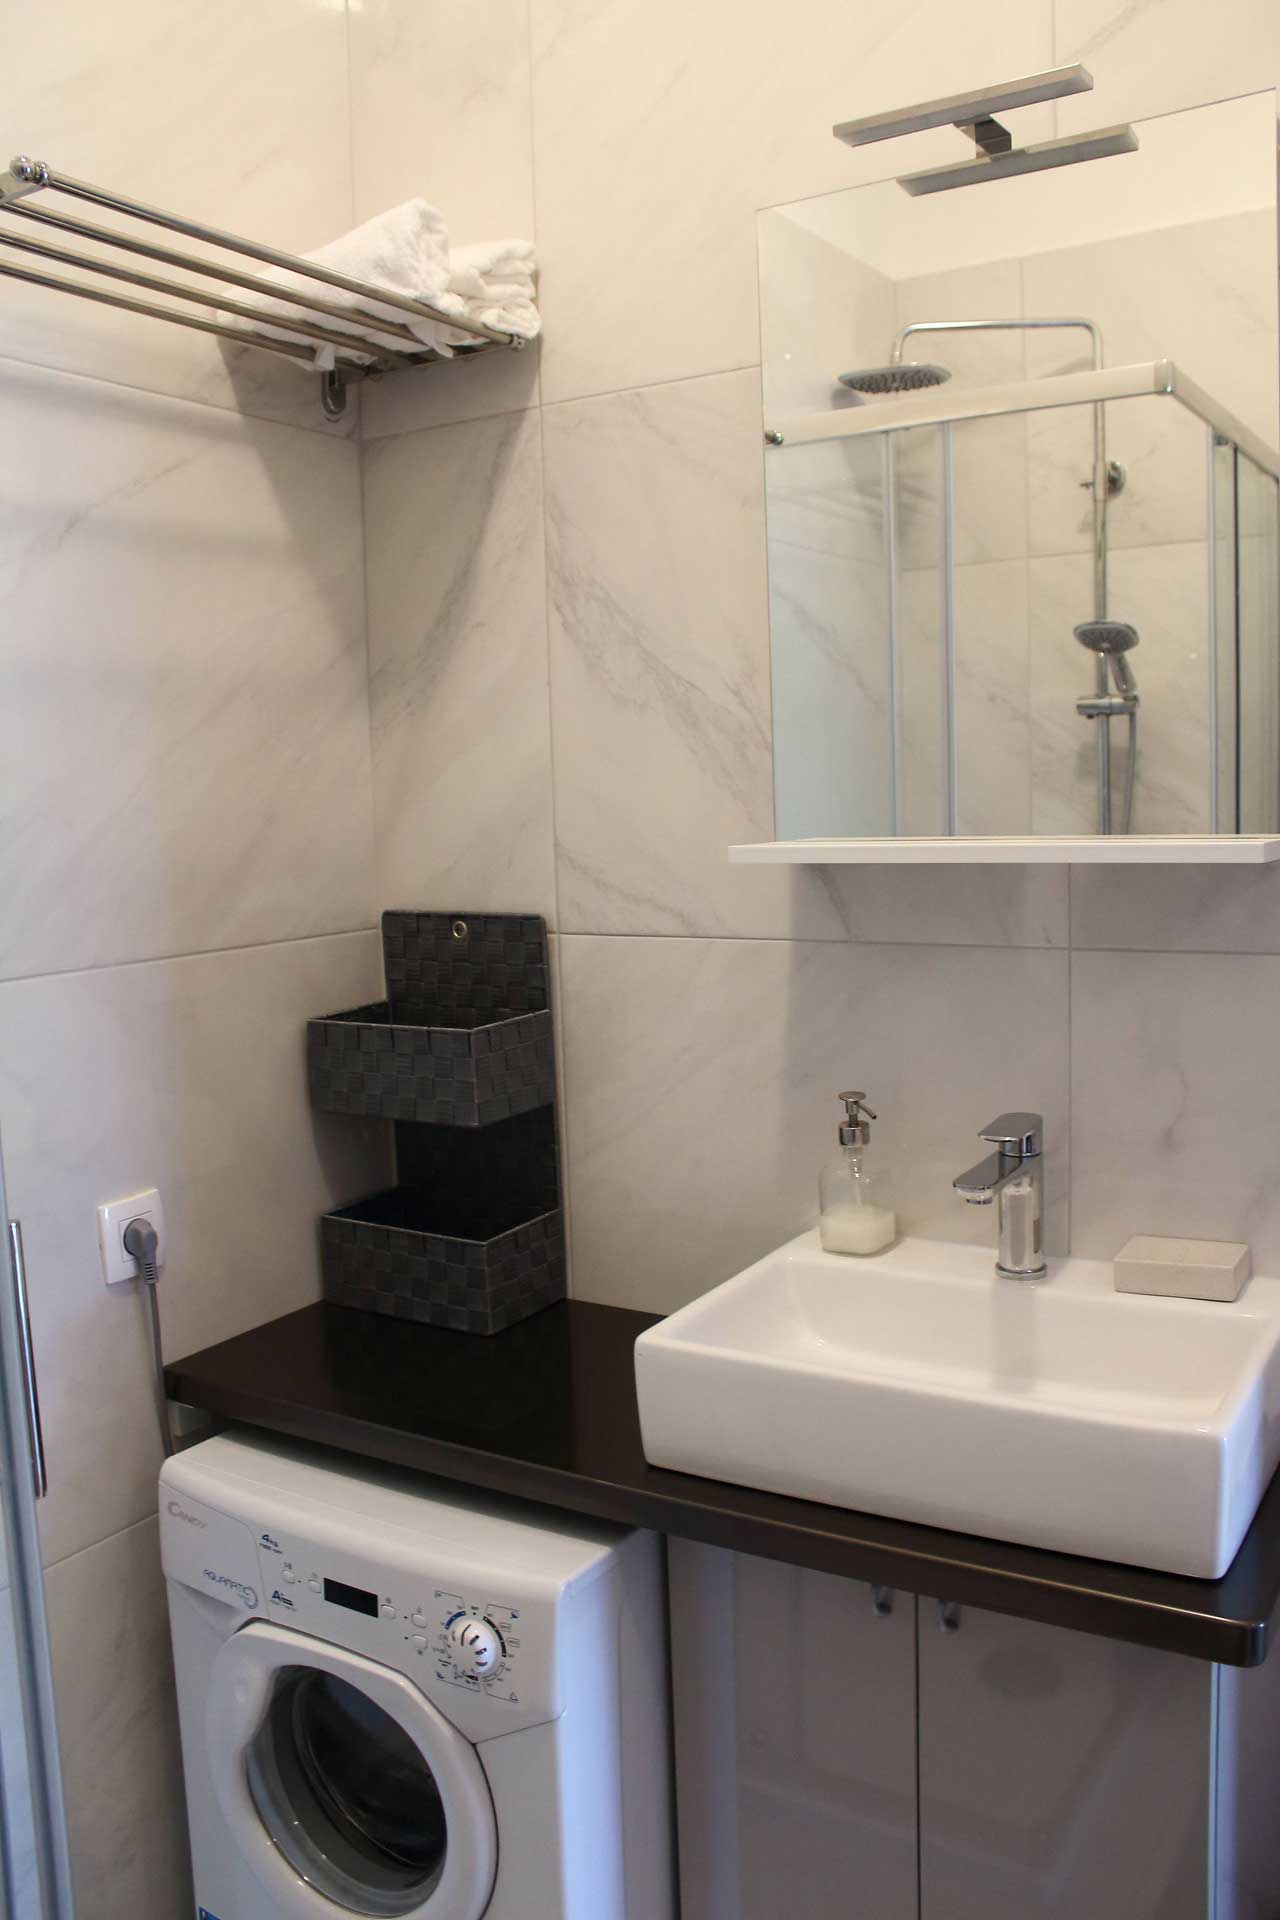 Apartments Basan Lovran-Opatija, apartment 2+2 bathroom with washing machine